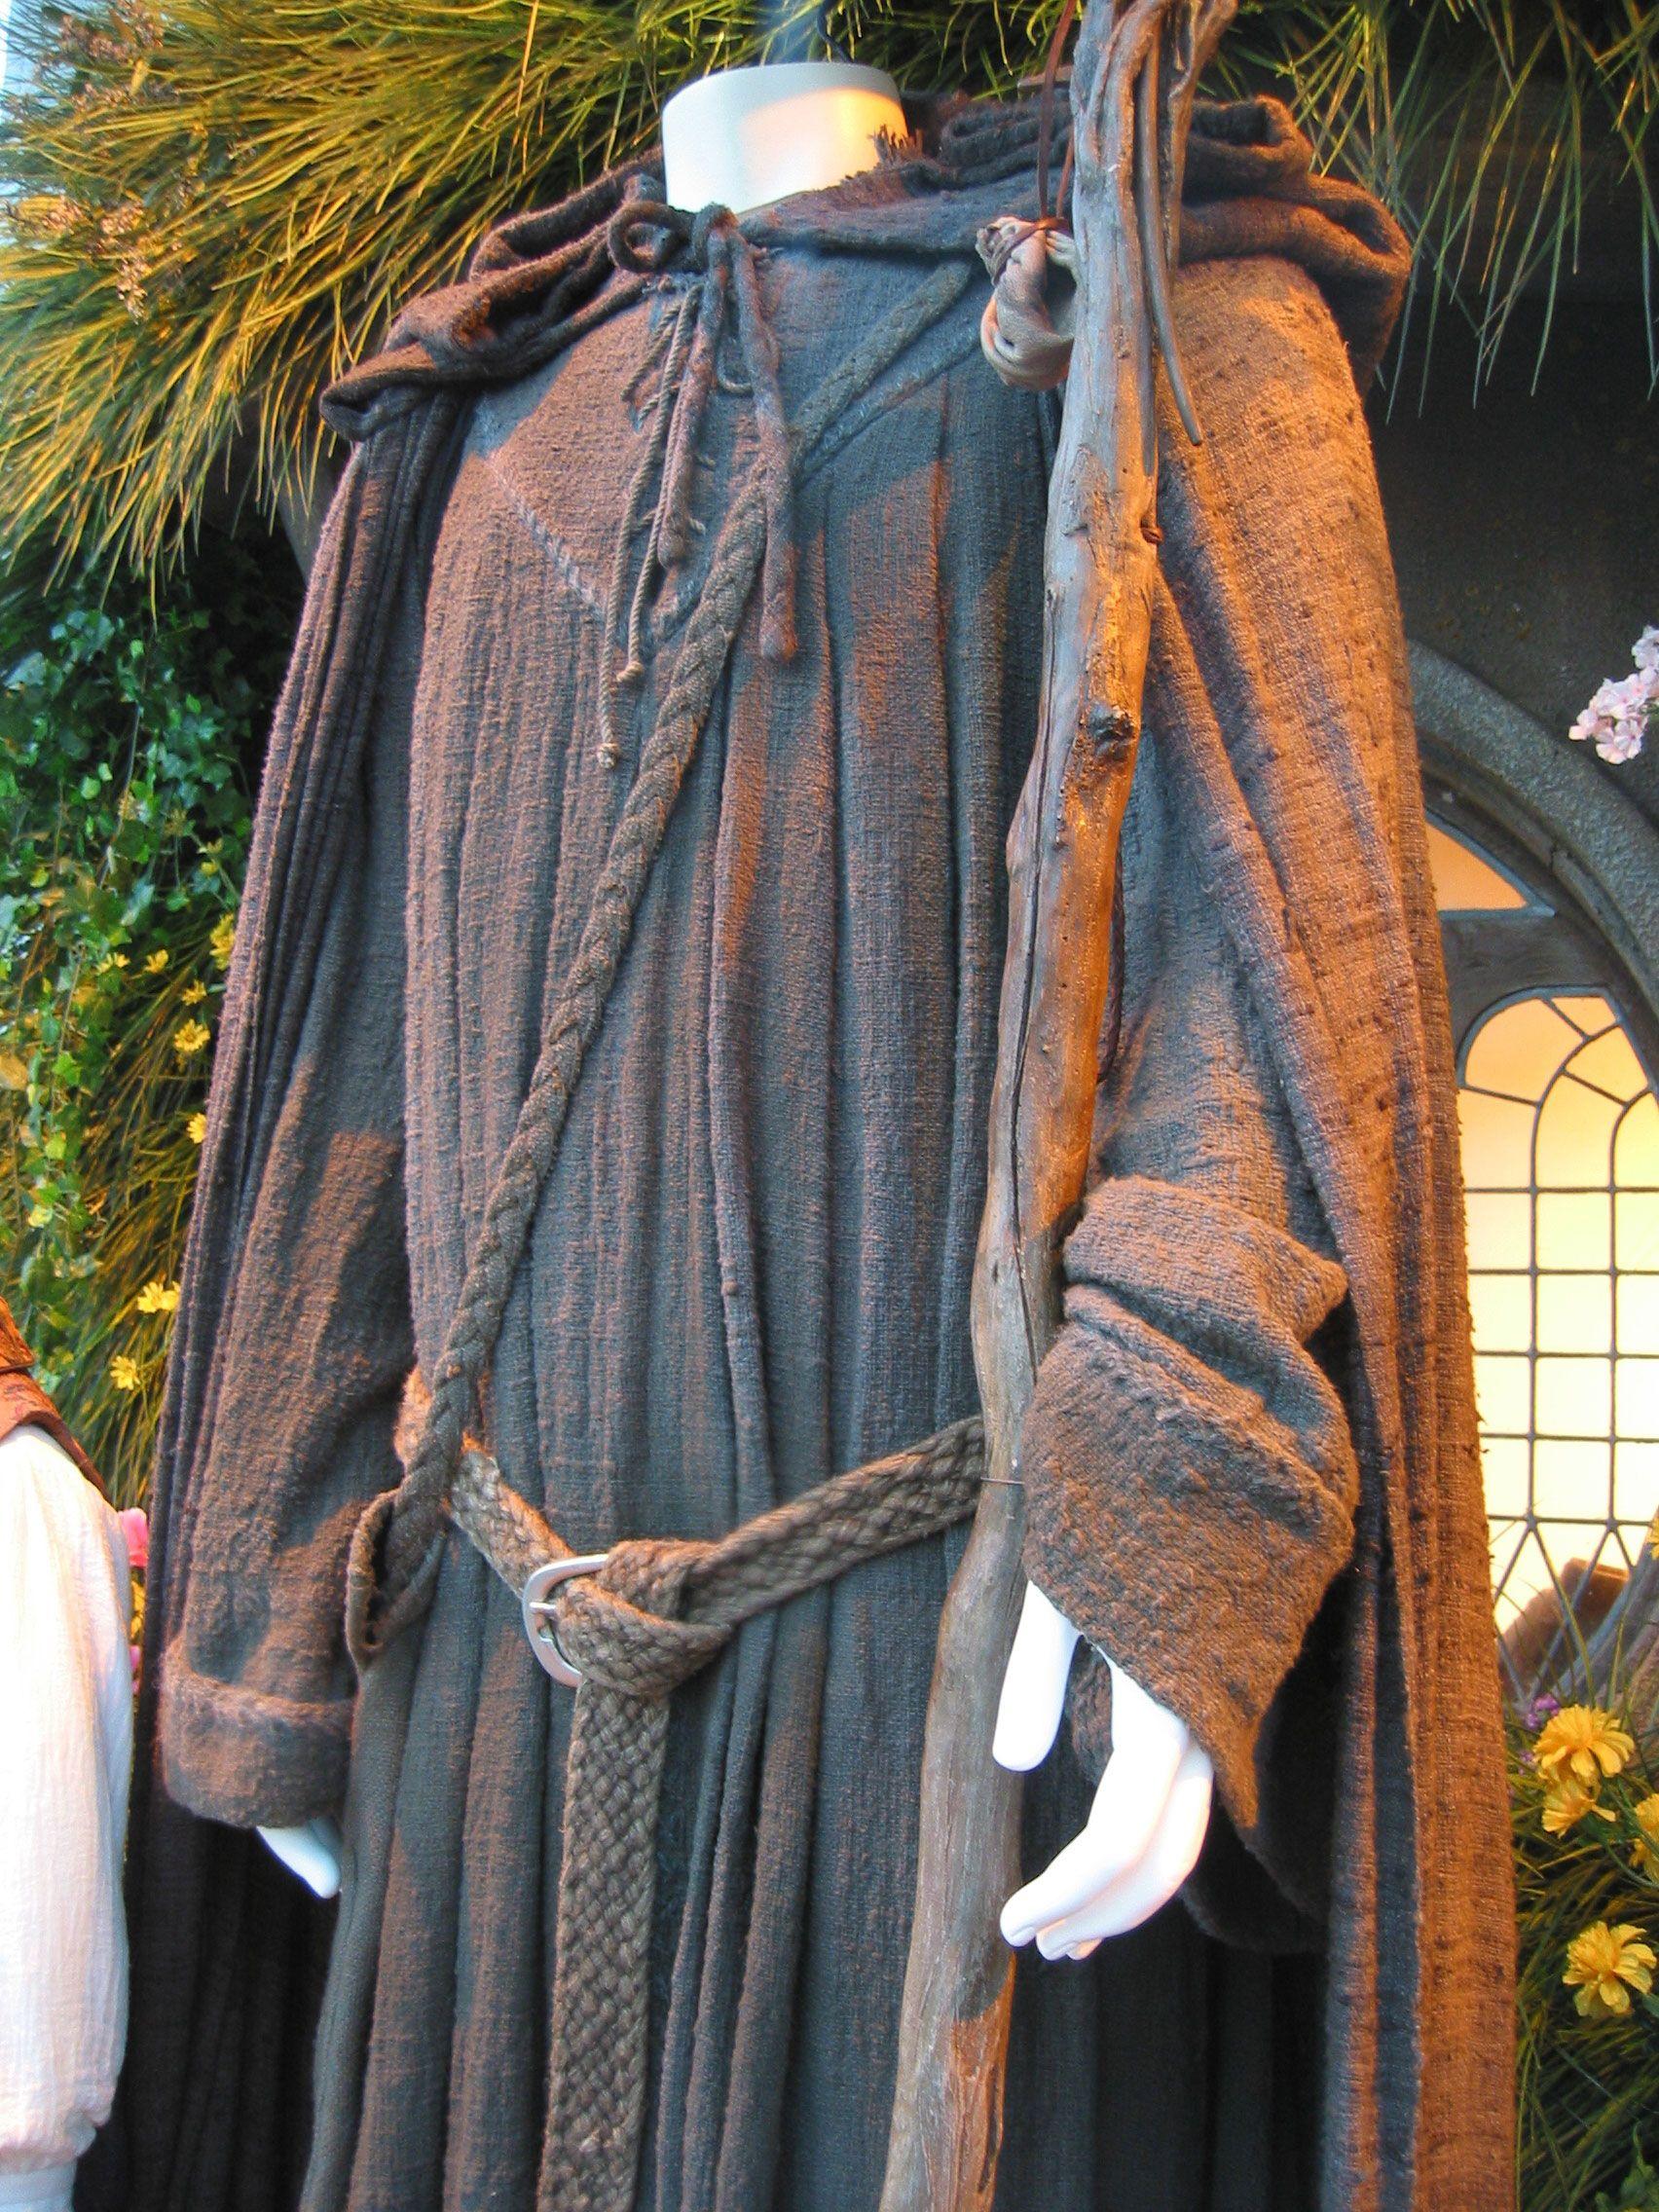 gandalf the grey hat pattern - Google Search | wizard ...